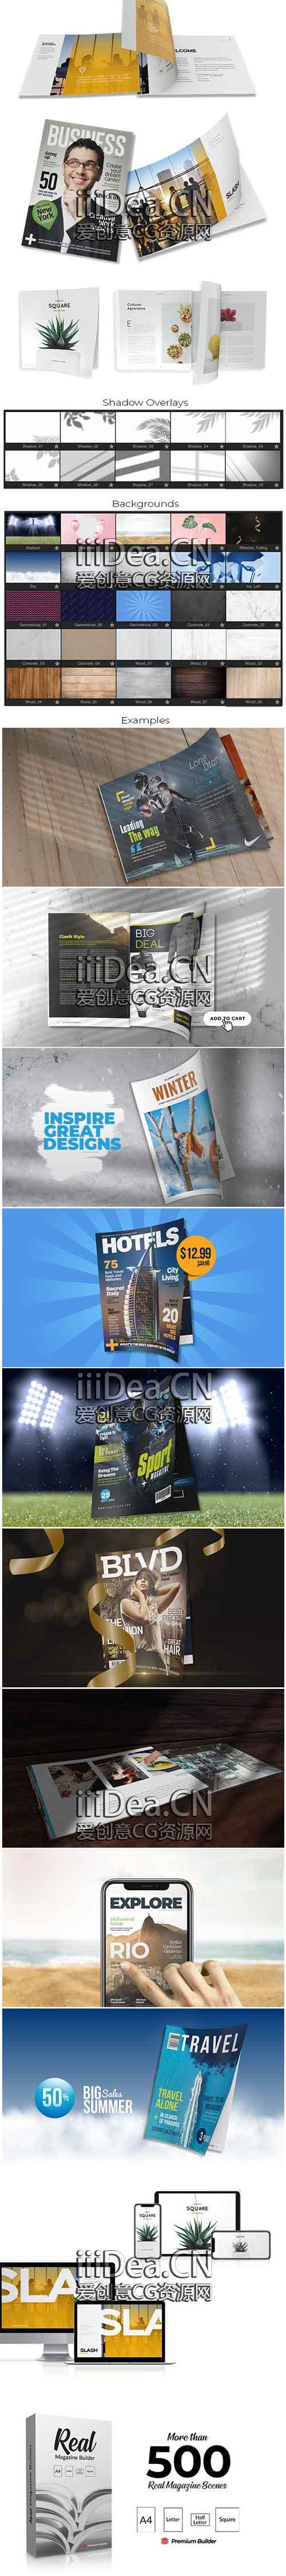 29703858 - AE扩展 - Element 3D(E3D)杂志图文书籍宣传册动画生成器动画插件